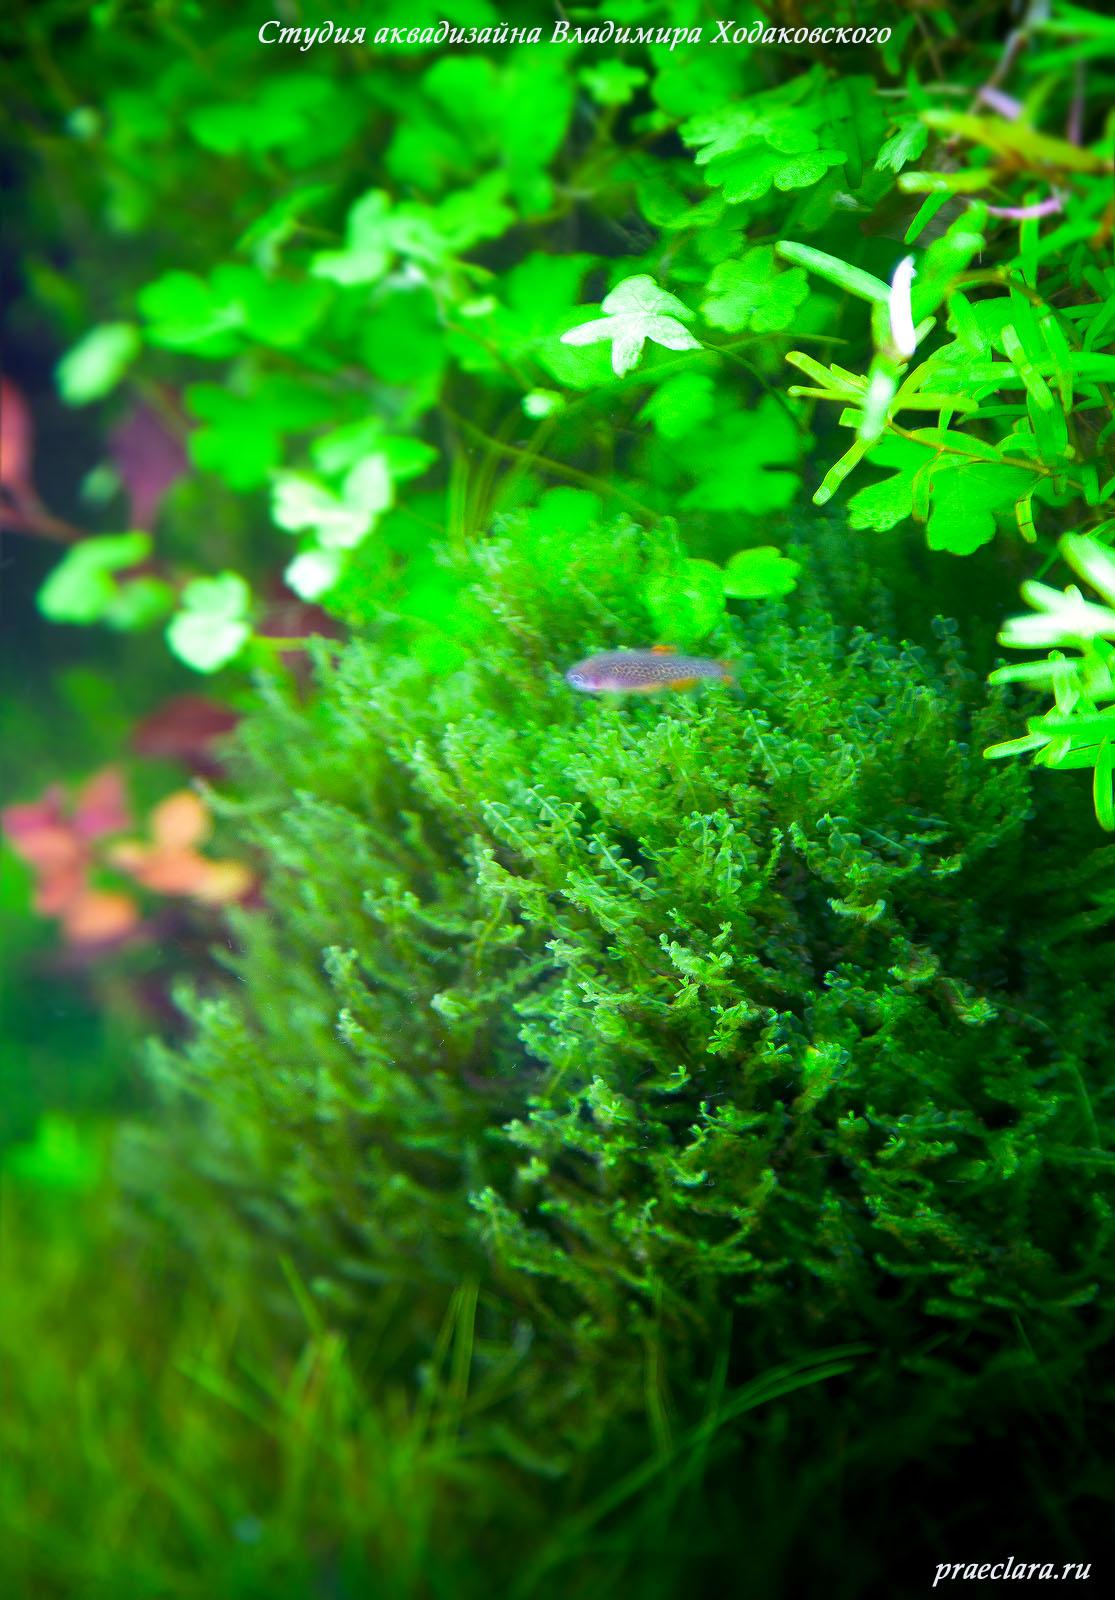 Blepharostoma-trichophyllum - Pearl-moss